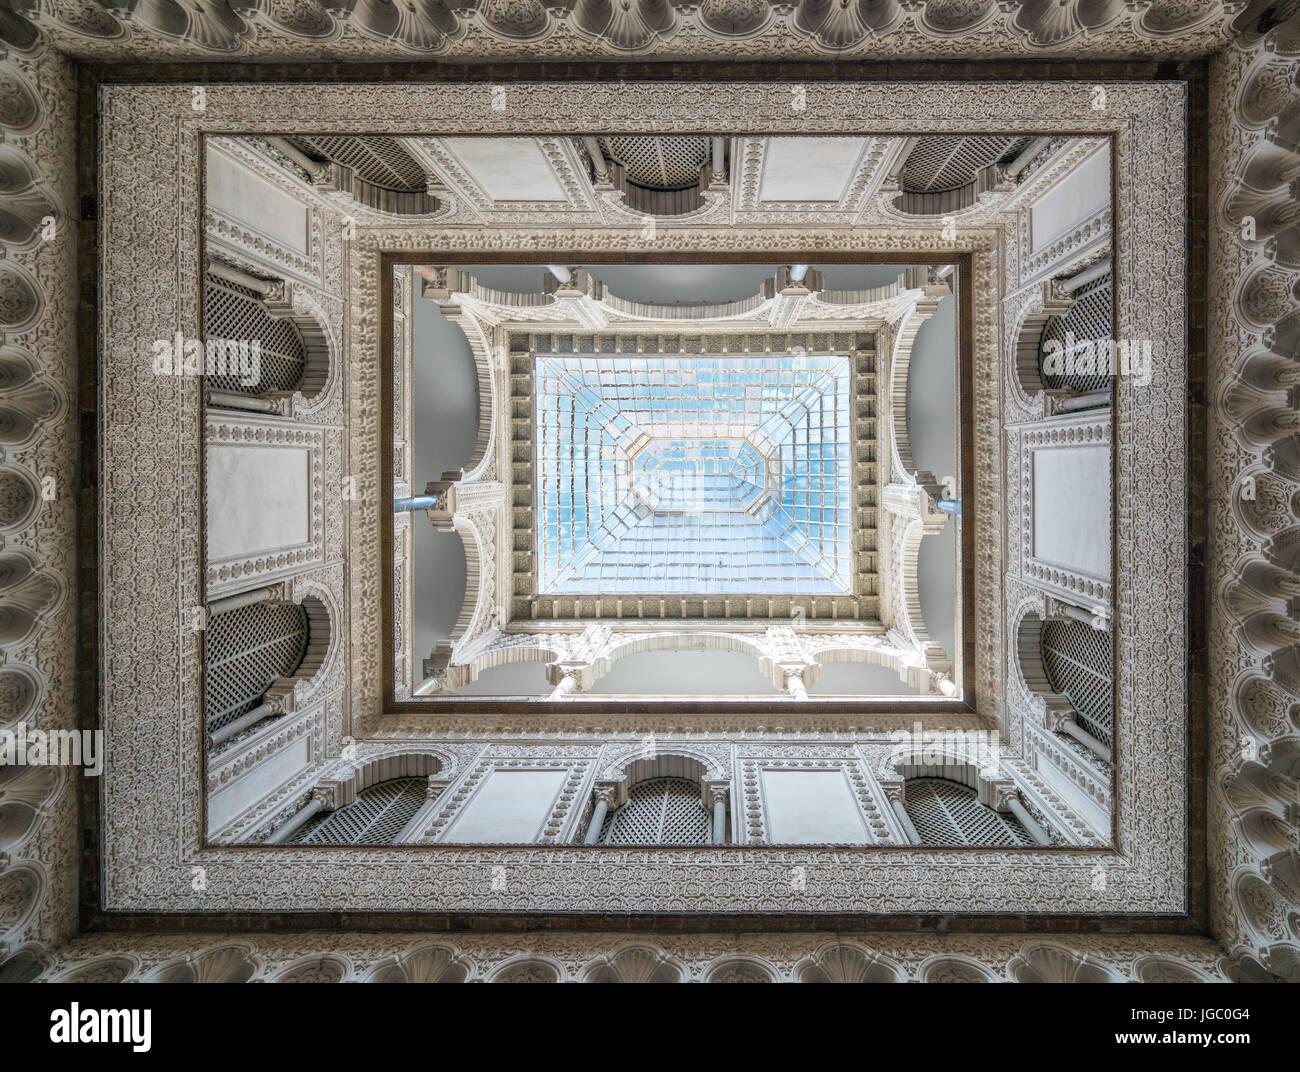 Architecture of the Patio de las Munecas in the Alcazar, Seville, Andalucia, Spain. Stock Photo